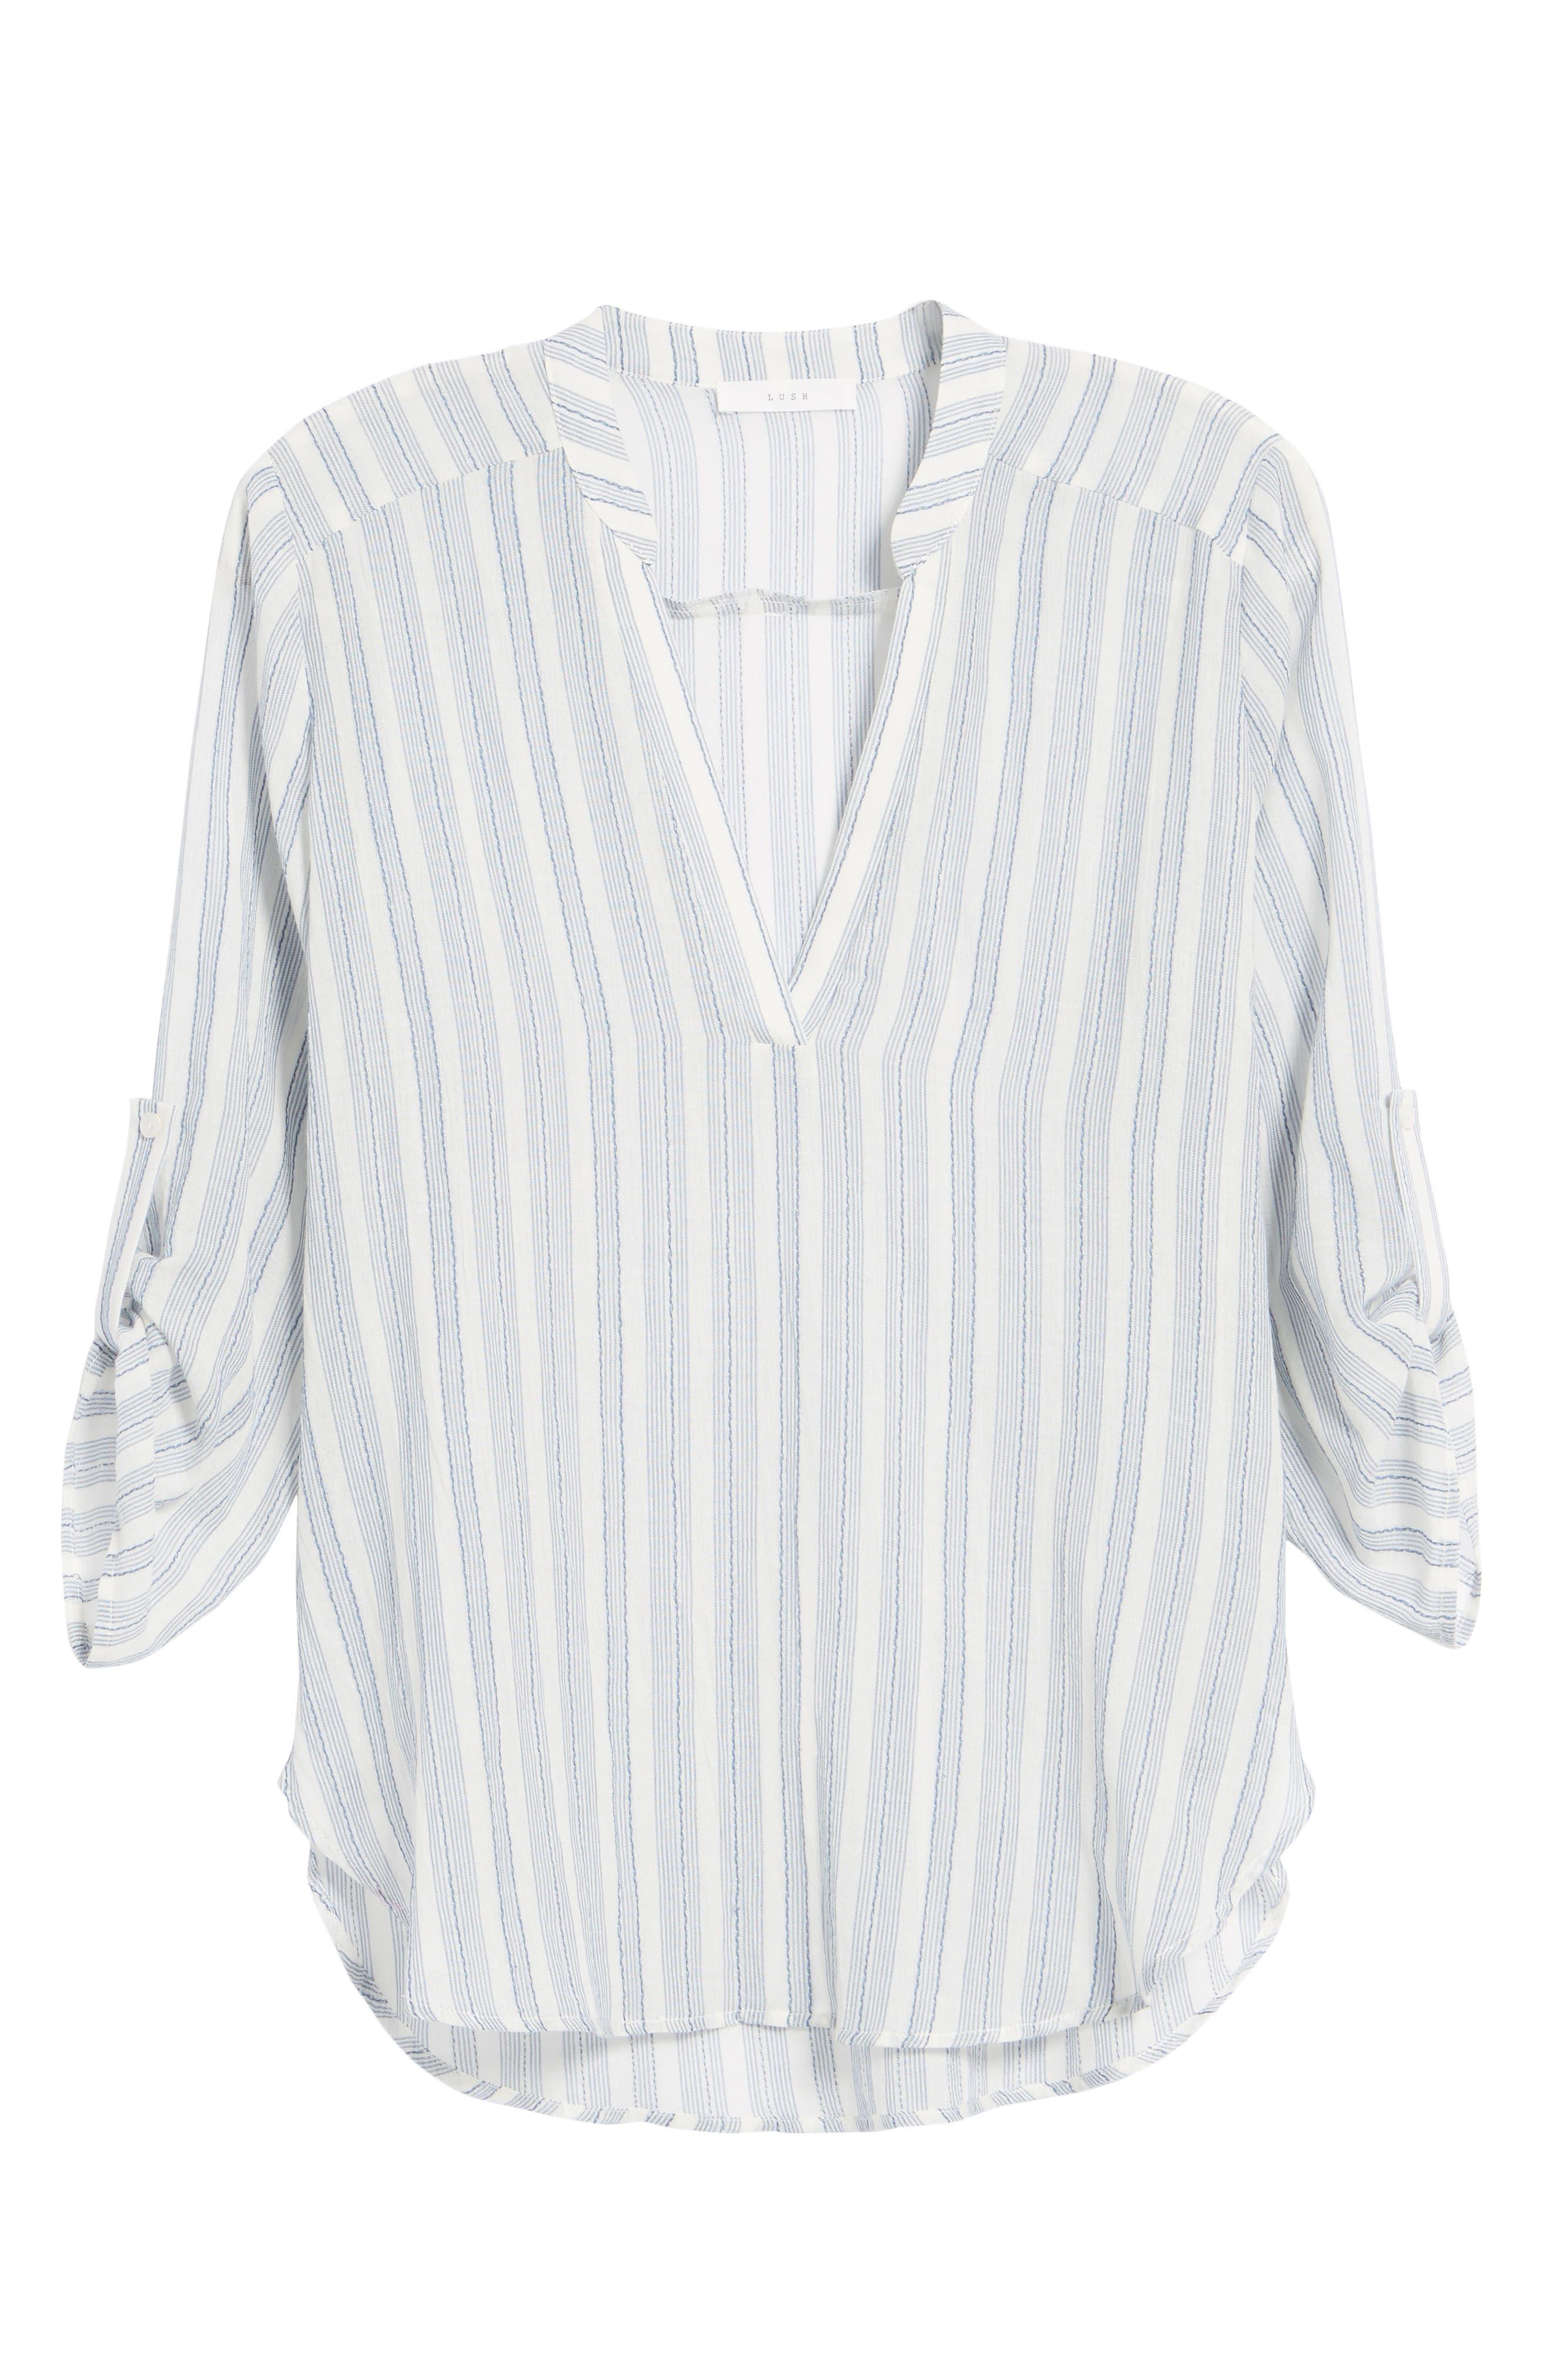 Stripe Cotton Split Neck Top,                             Alternate thumbnail 6, color,                             Blue/ White Stripe